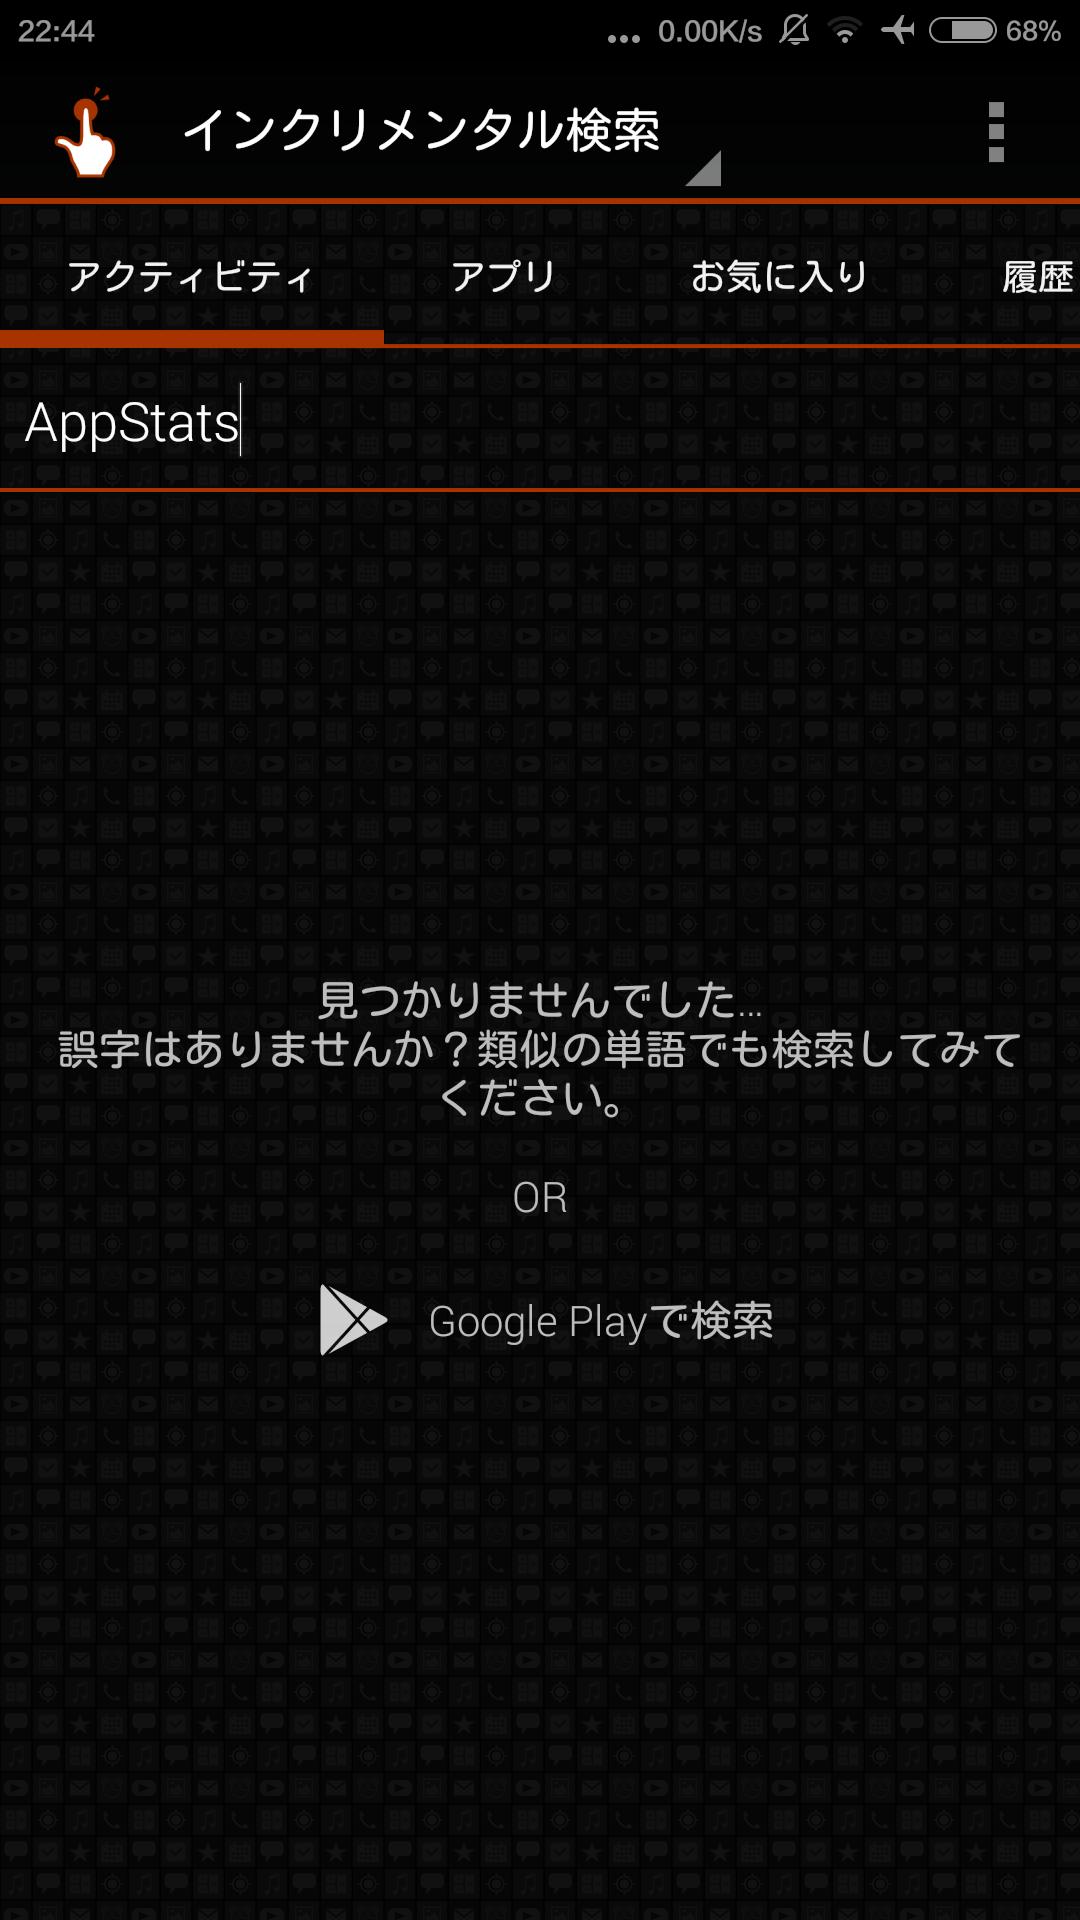 Screenshot_2015-03-09-22-44-27.png